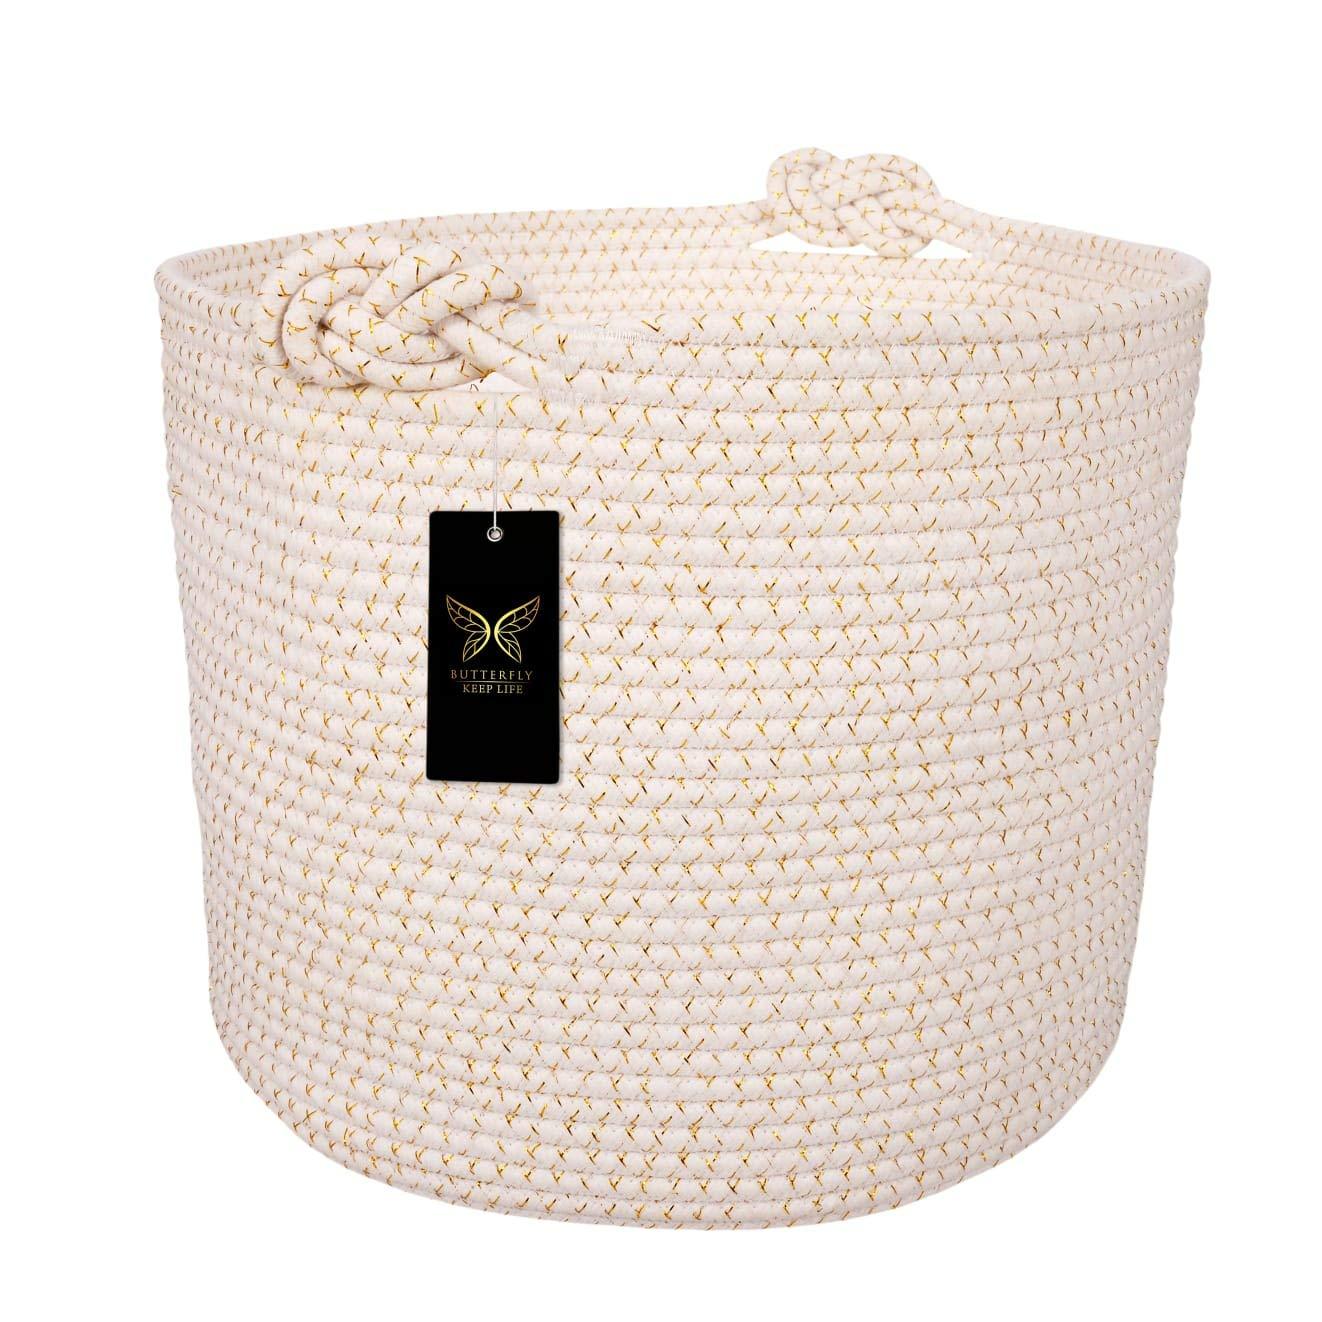 "Woven Cotton Rope Storage Basket | Decorative, Elegant & Durable Laundry Hamper | Ergonomic & Multipurpose White Blanket Bin | Stylish & Practical Nursery Organizer | Great Gift Idea - 15""x 15''x 13"""